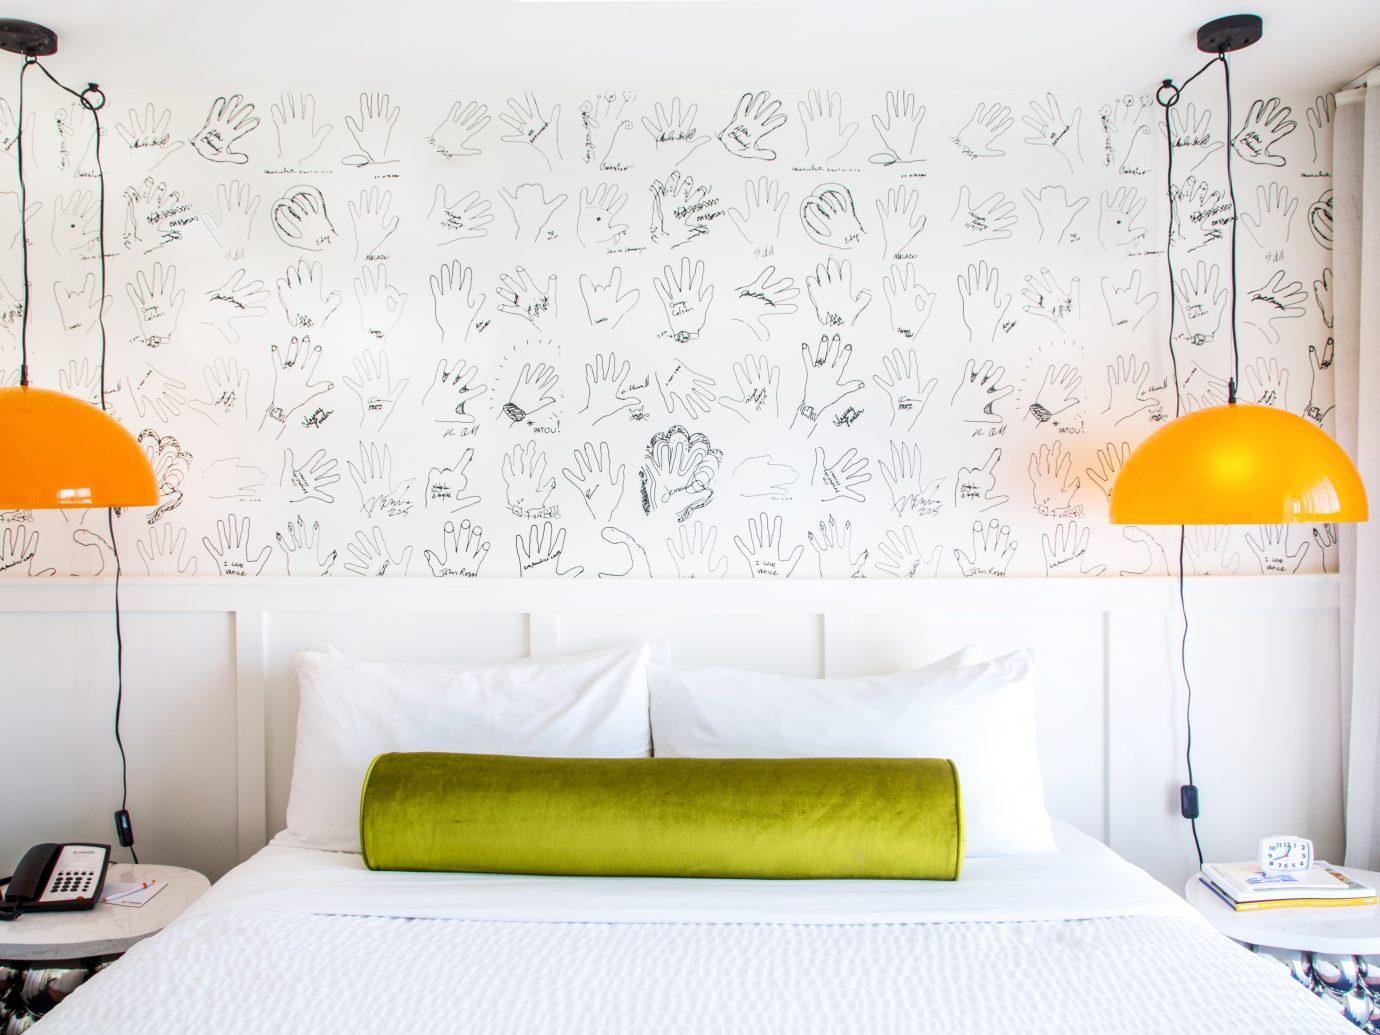 Bedroom at Hotel Erwin